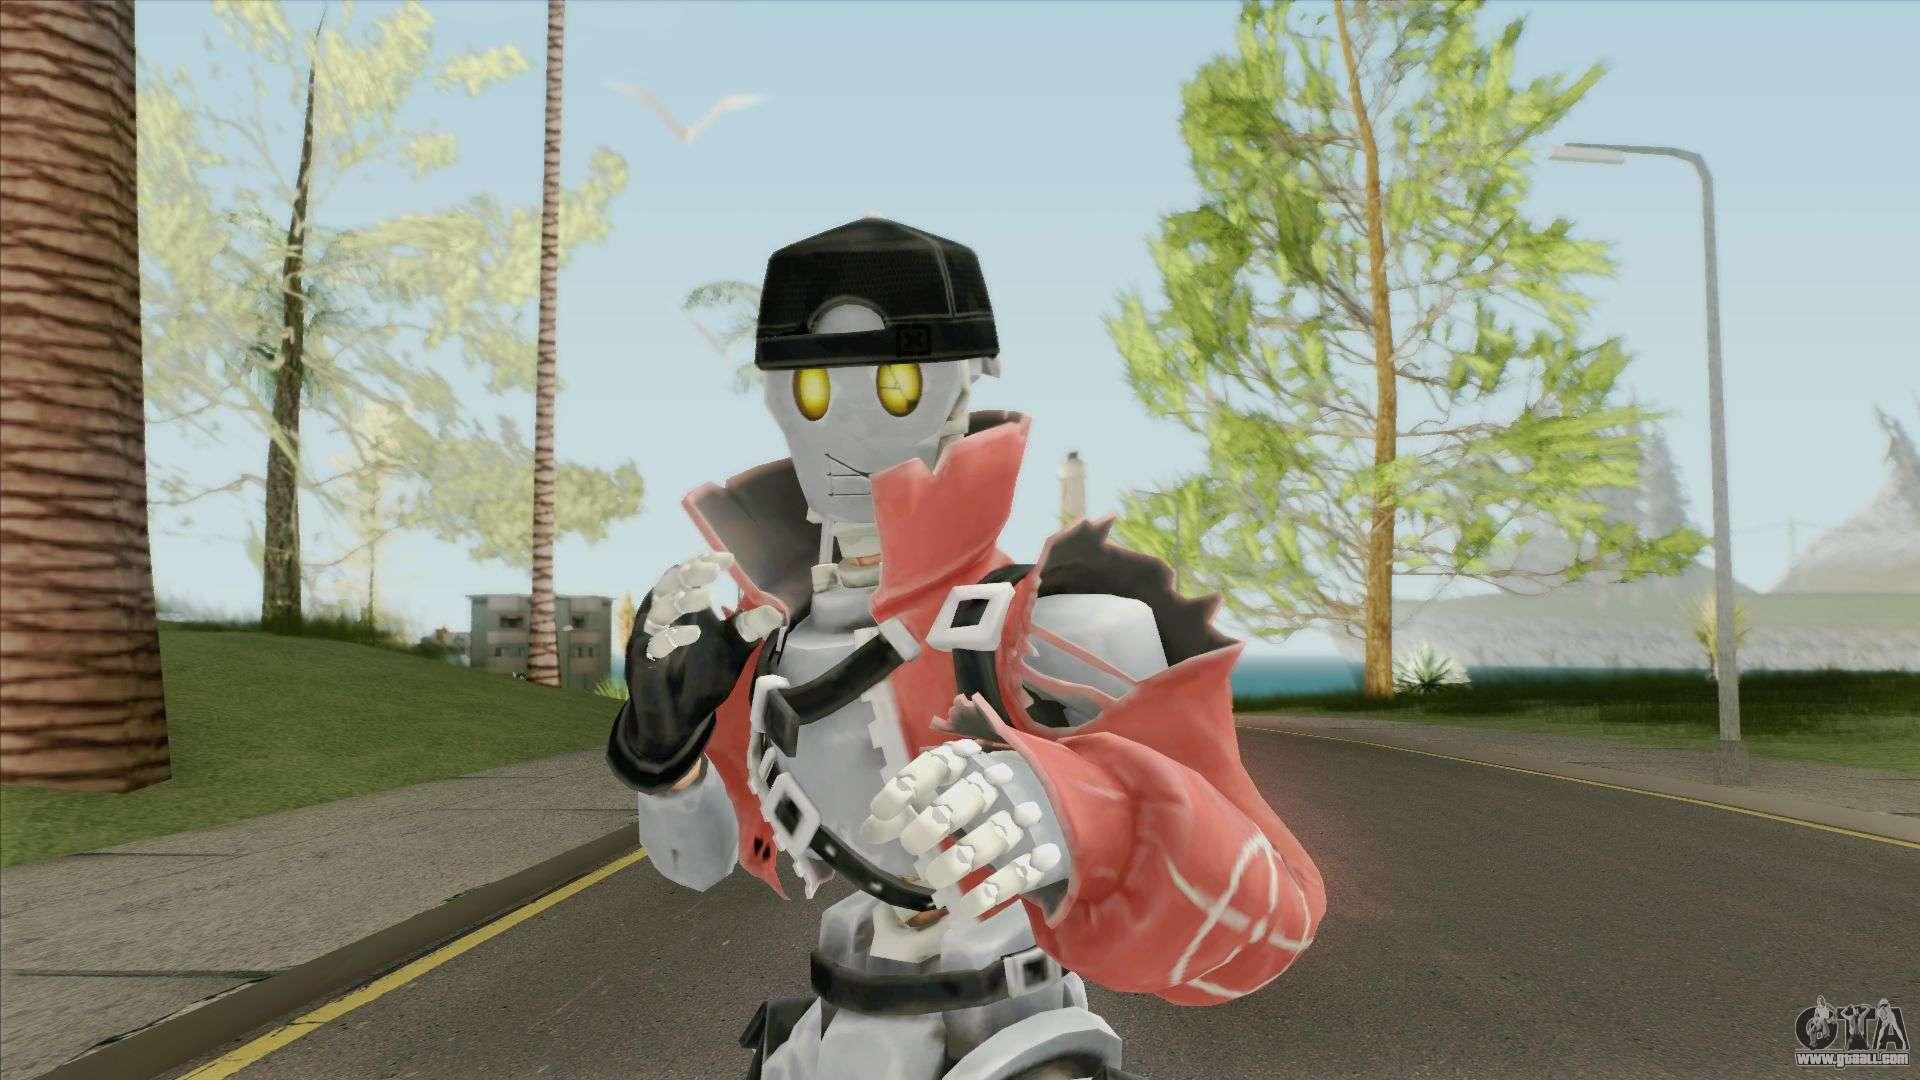 Rebel From Fortnite For GTA San Andreas